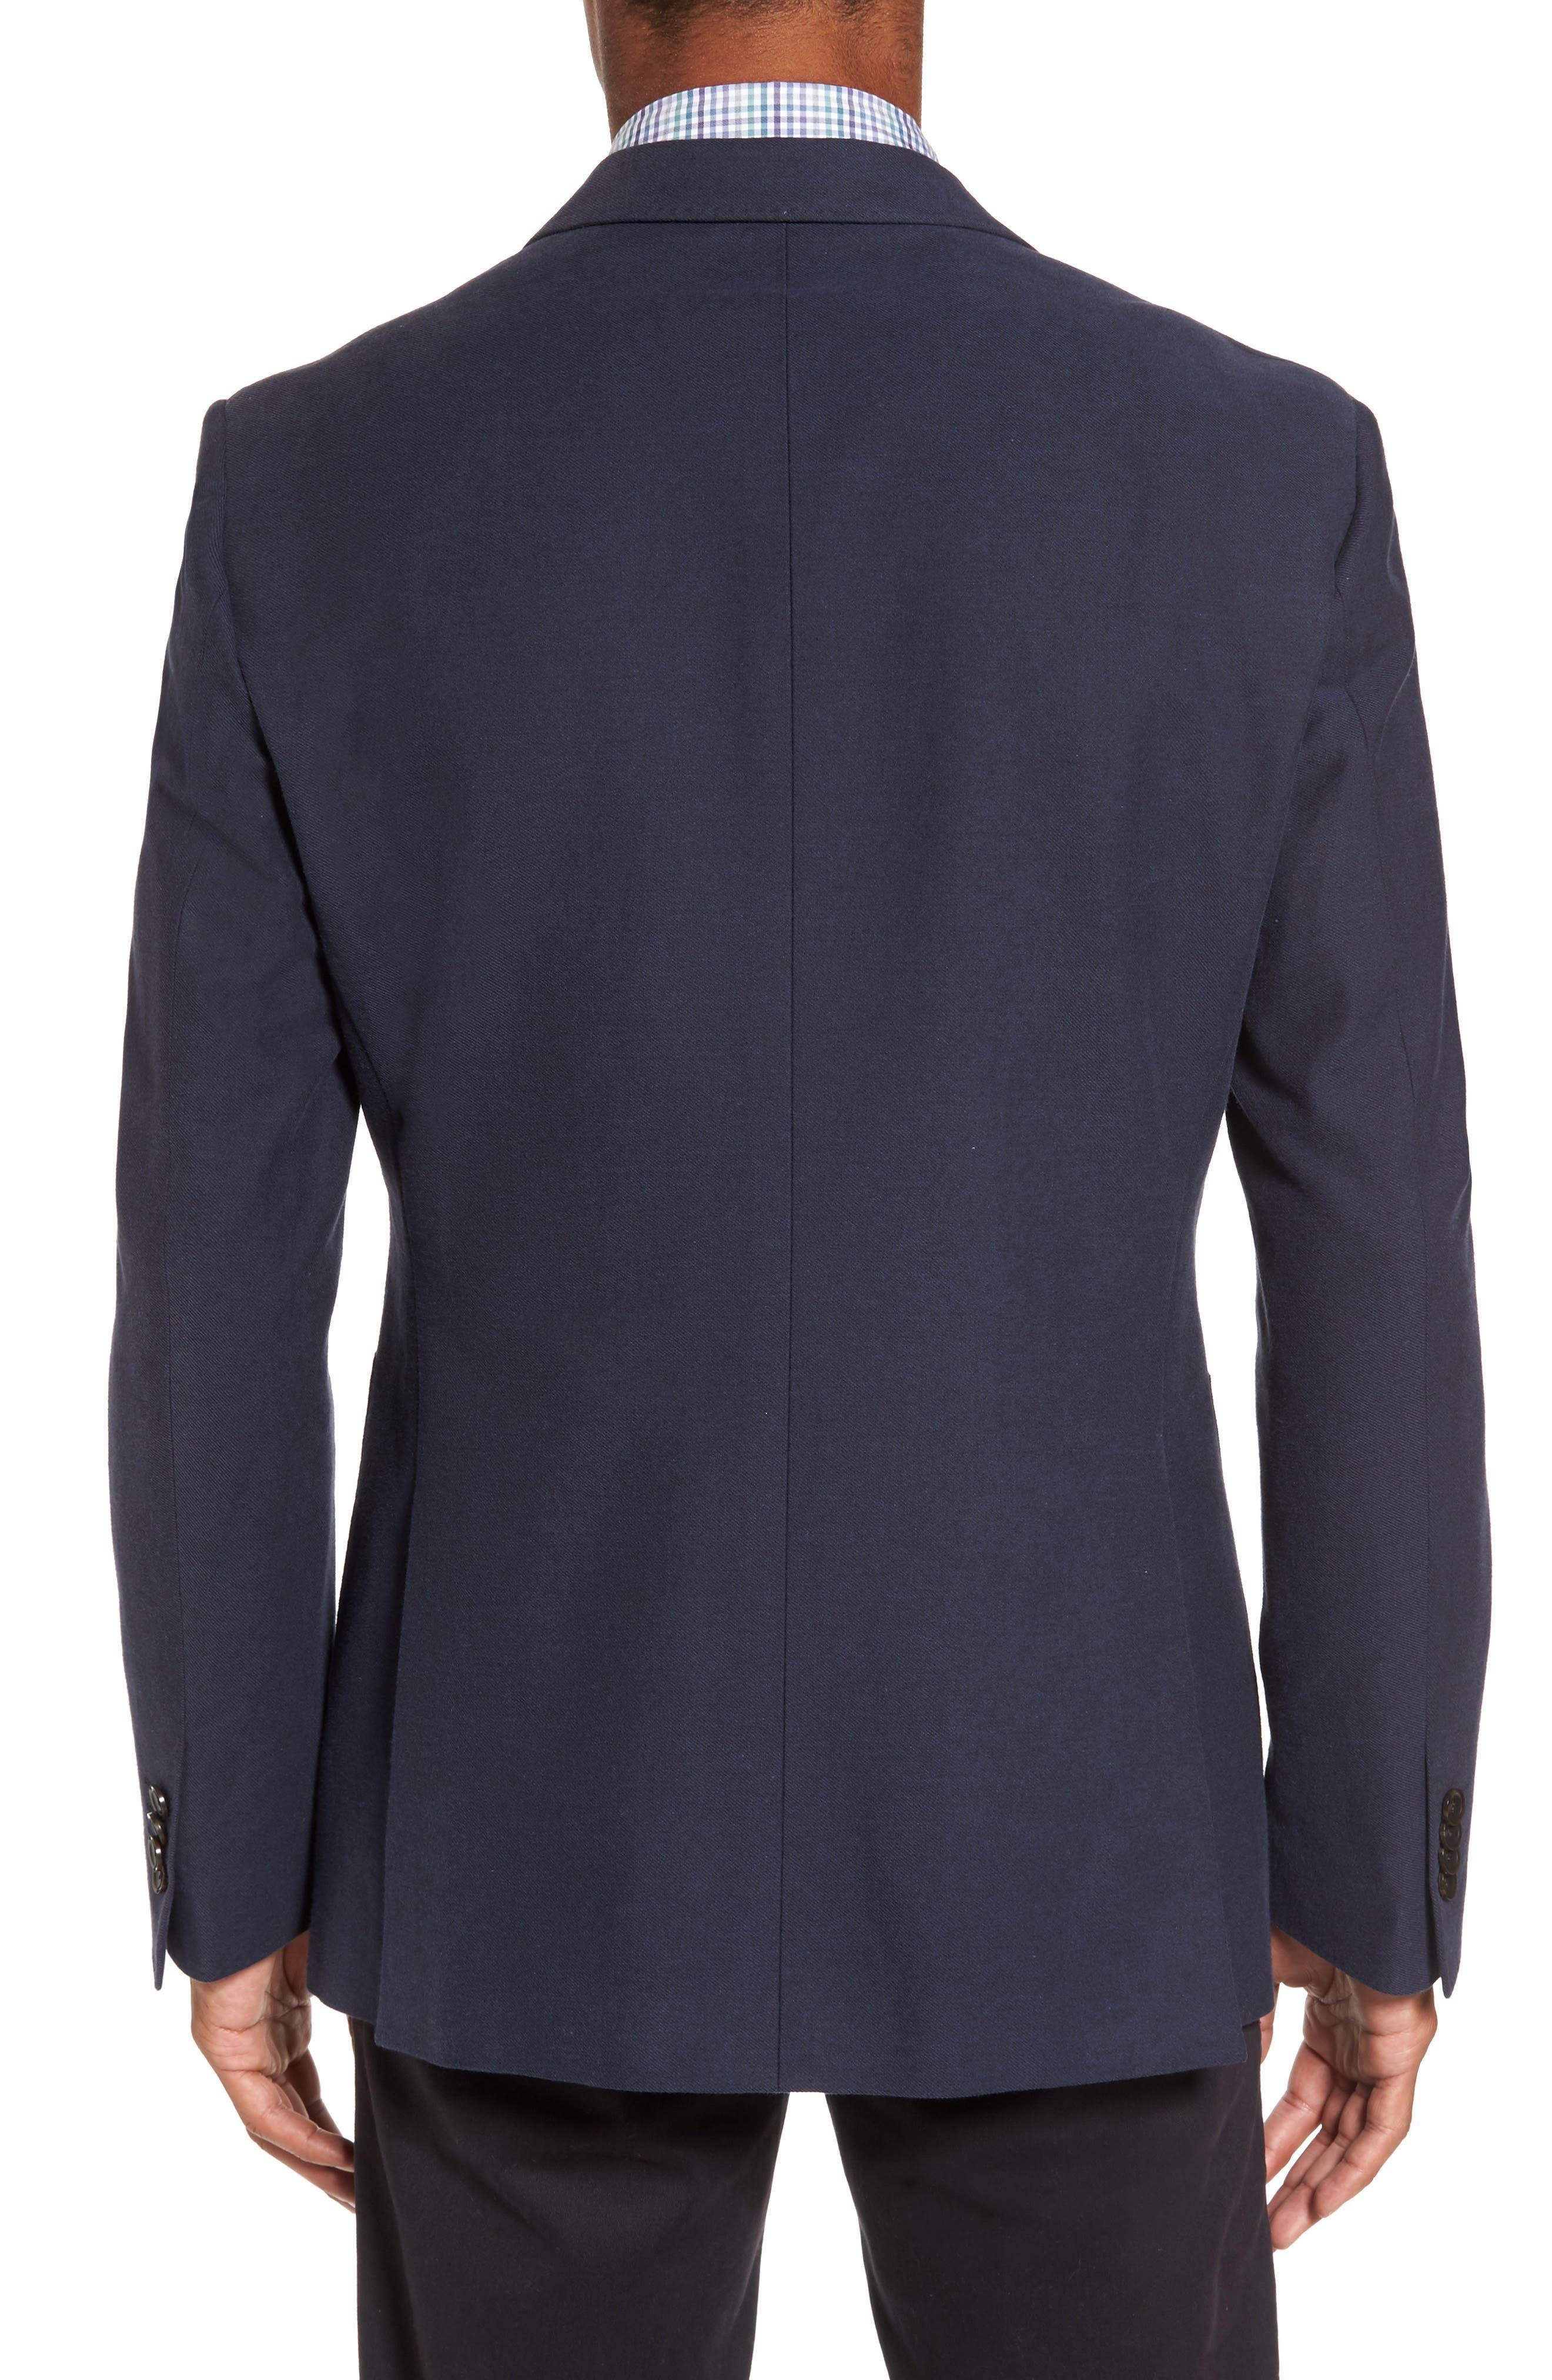 Pembroke Sports Fit Twill Jacket,                             Alternate thumbnail 2, color,                             410